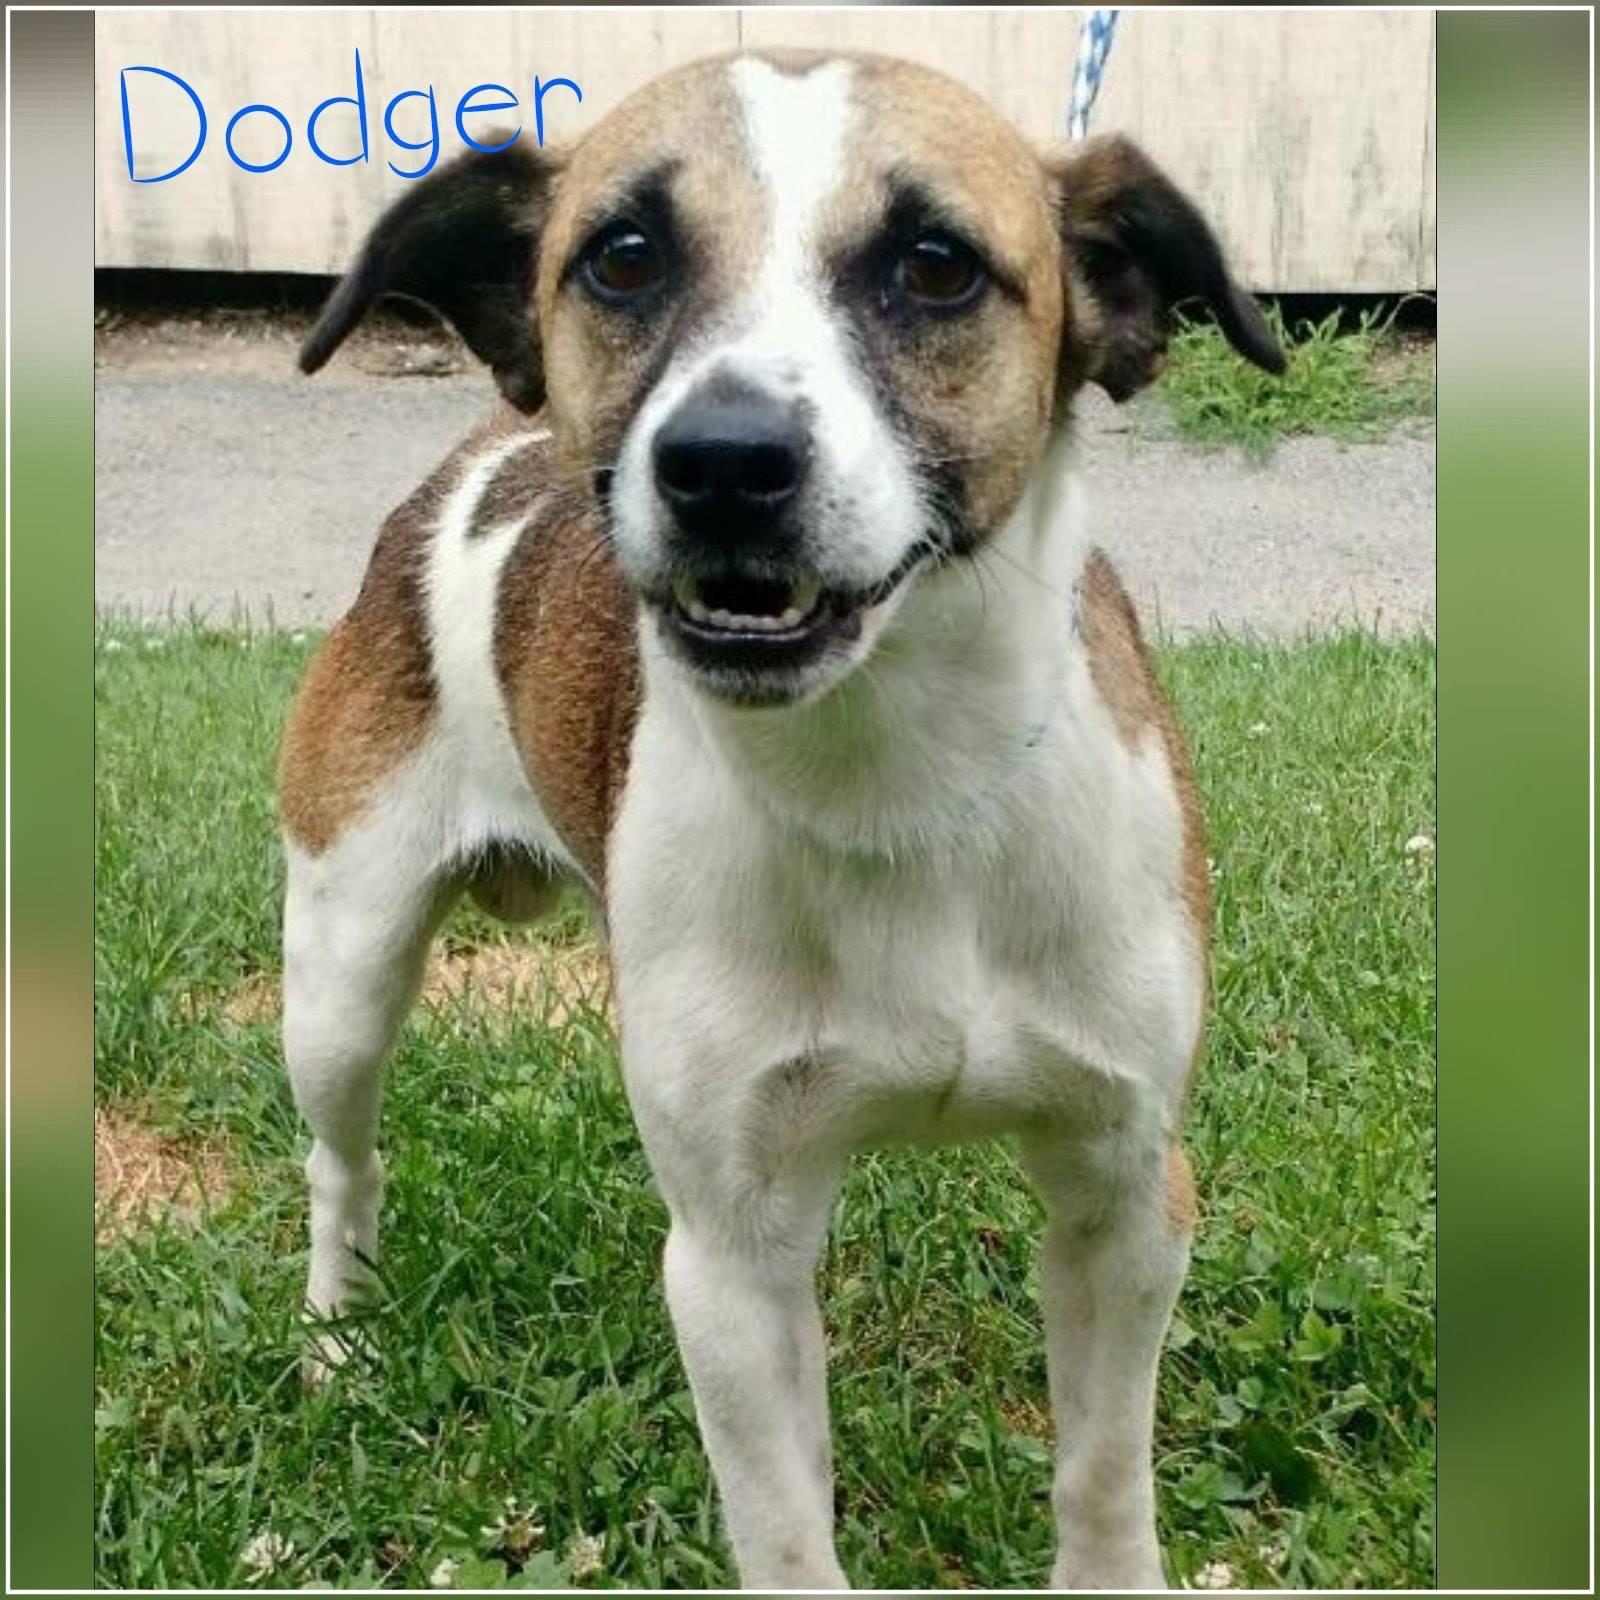 Dodger - Jack Russell Terrier Mix